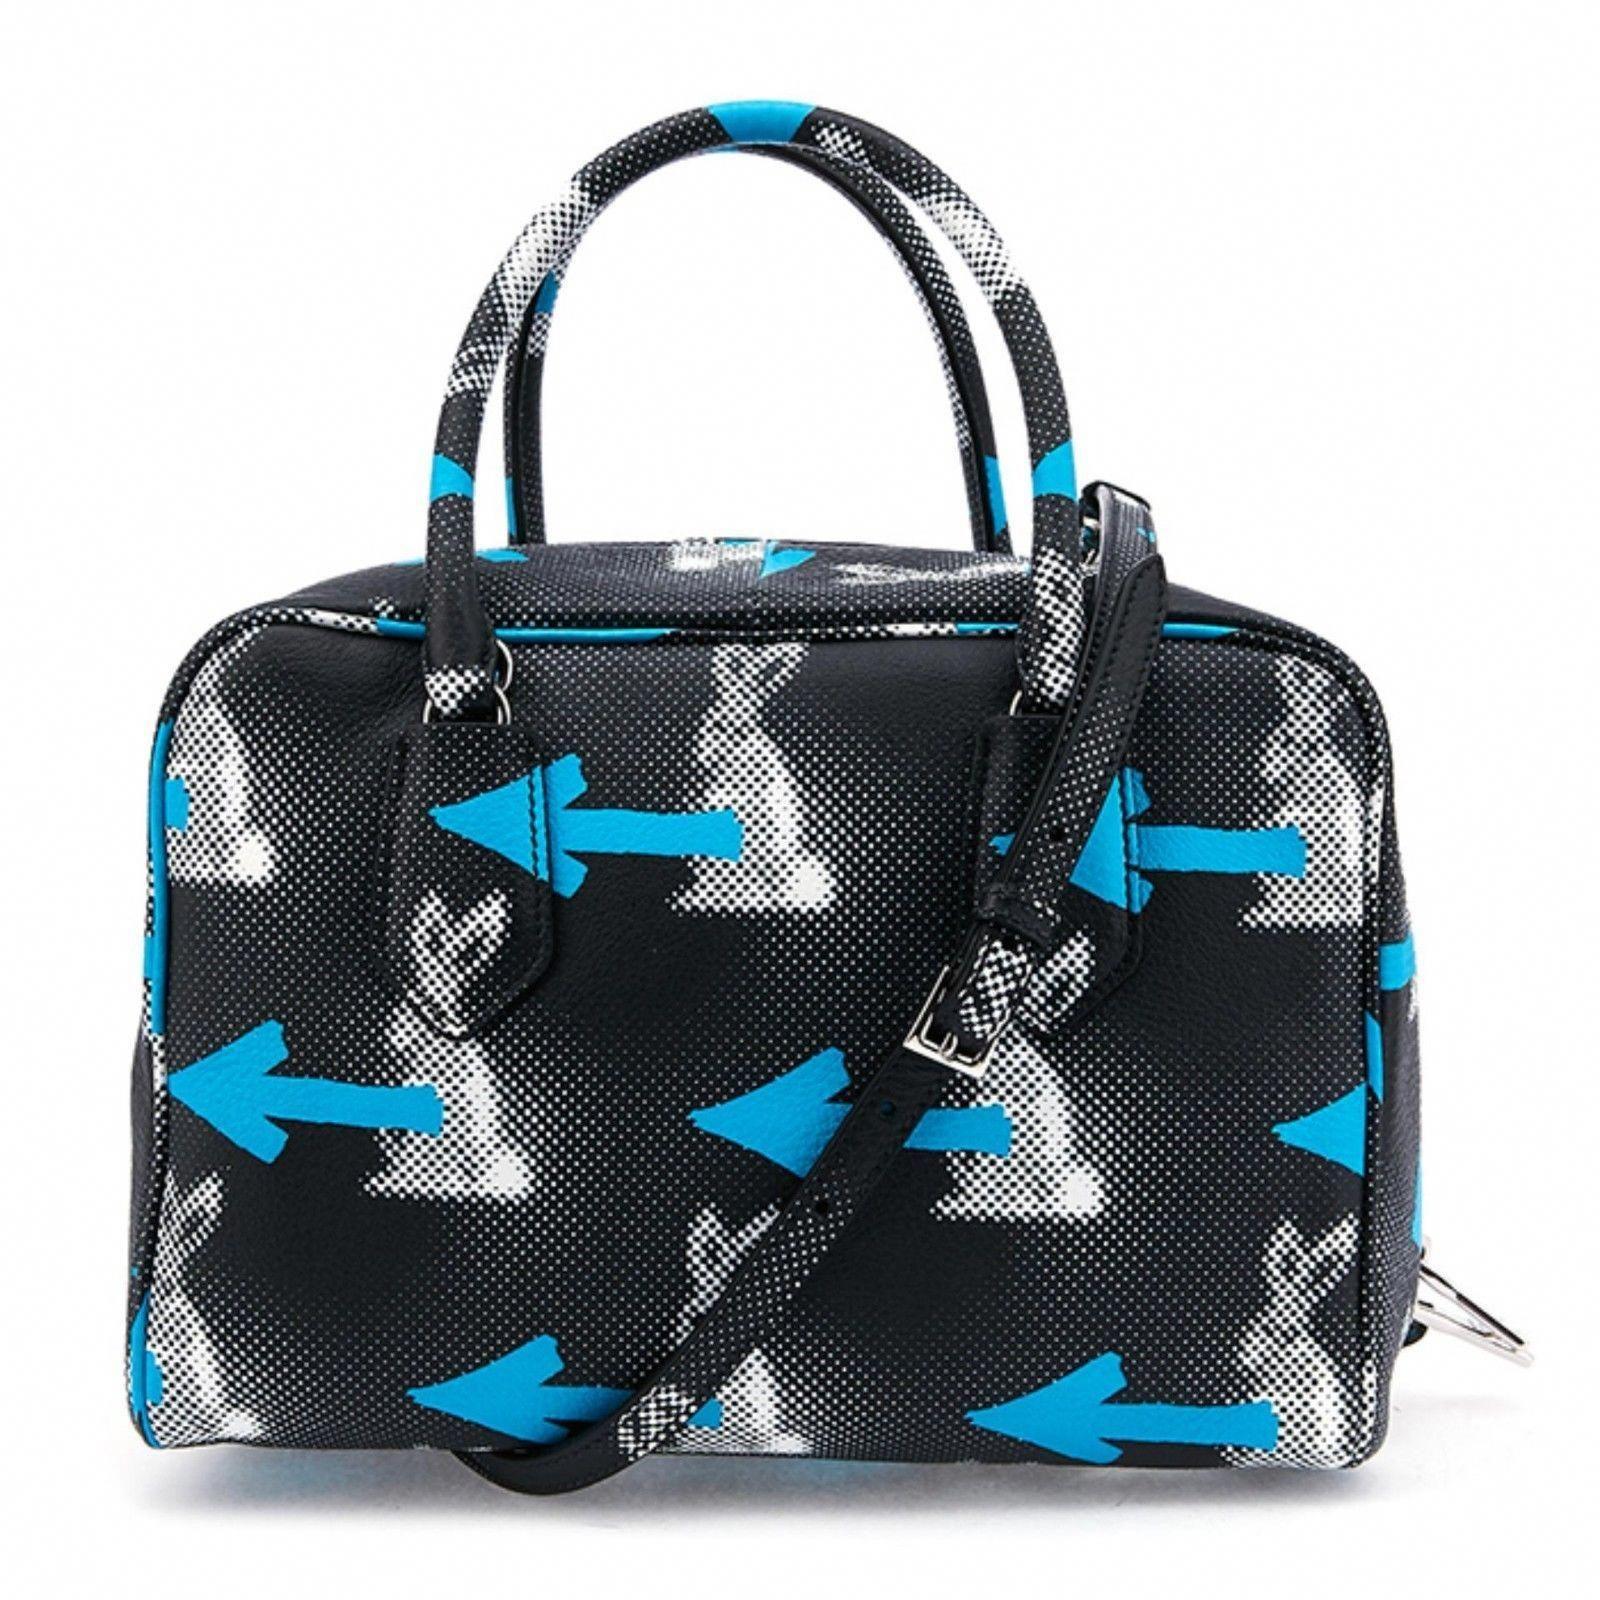 New RARE Authentic Prada Daino St. Rabbits Inside Bag Black Blue Purse   2995.0   4e730f1d98